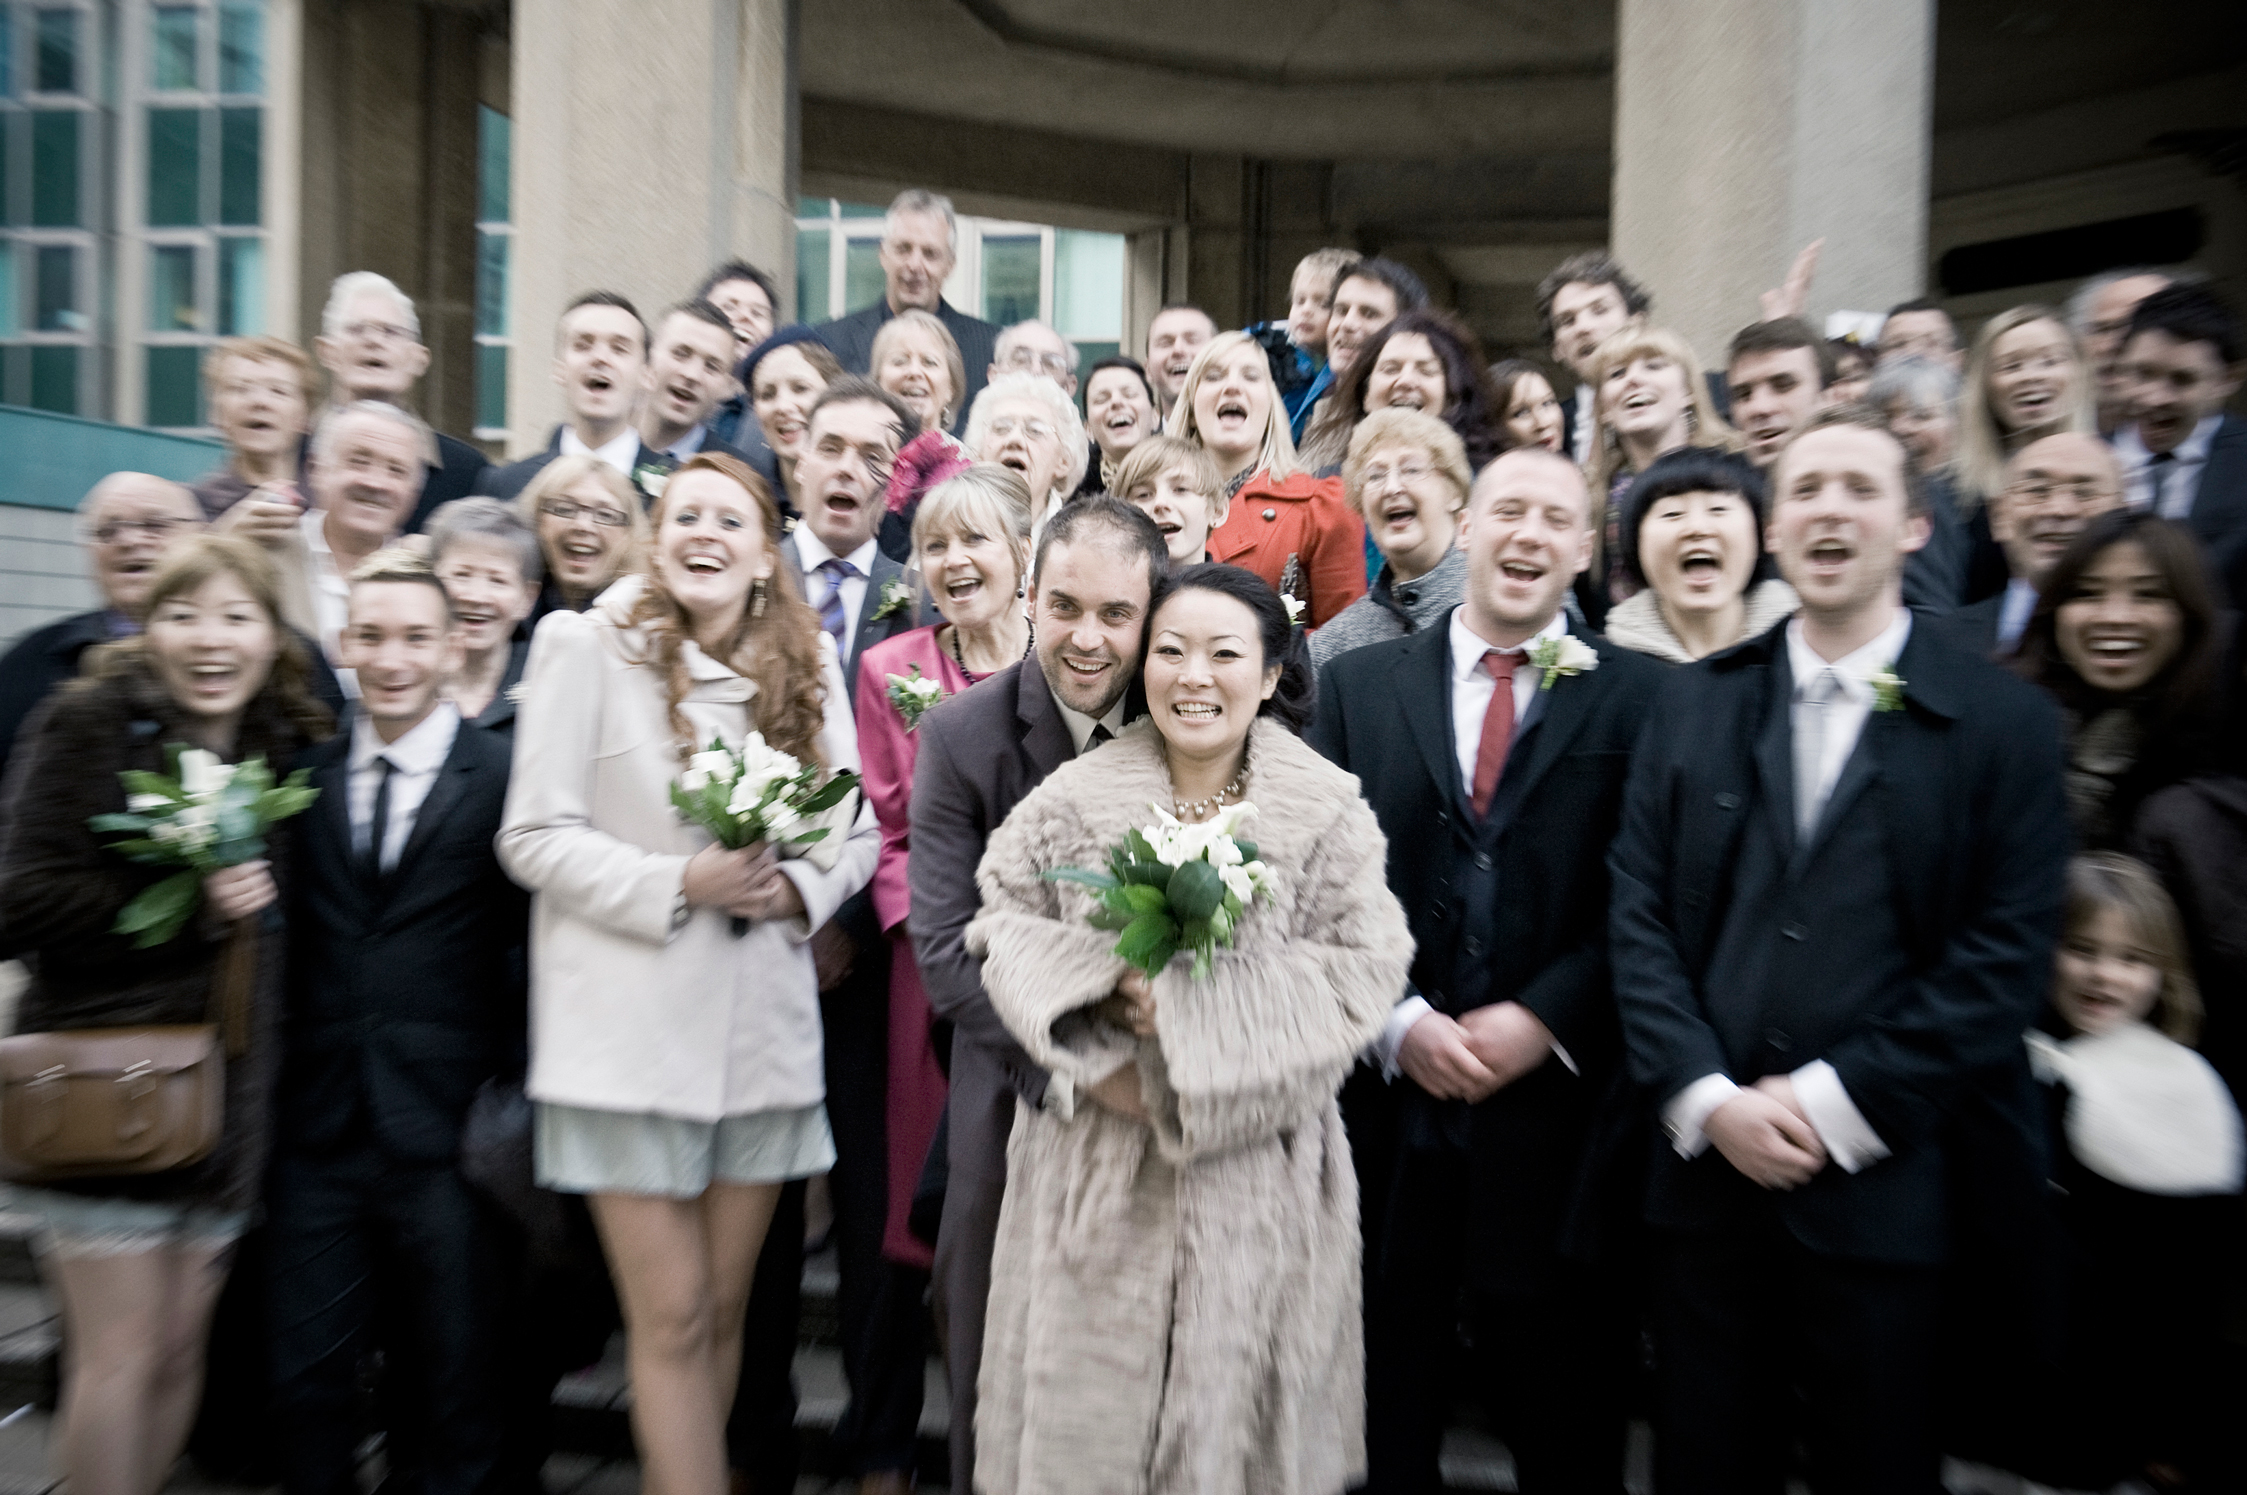 brighton_winter_wedding_11.jpg